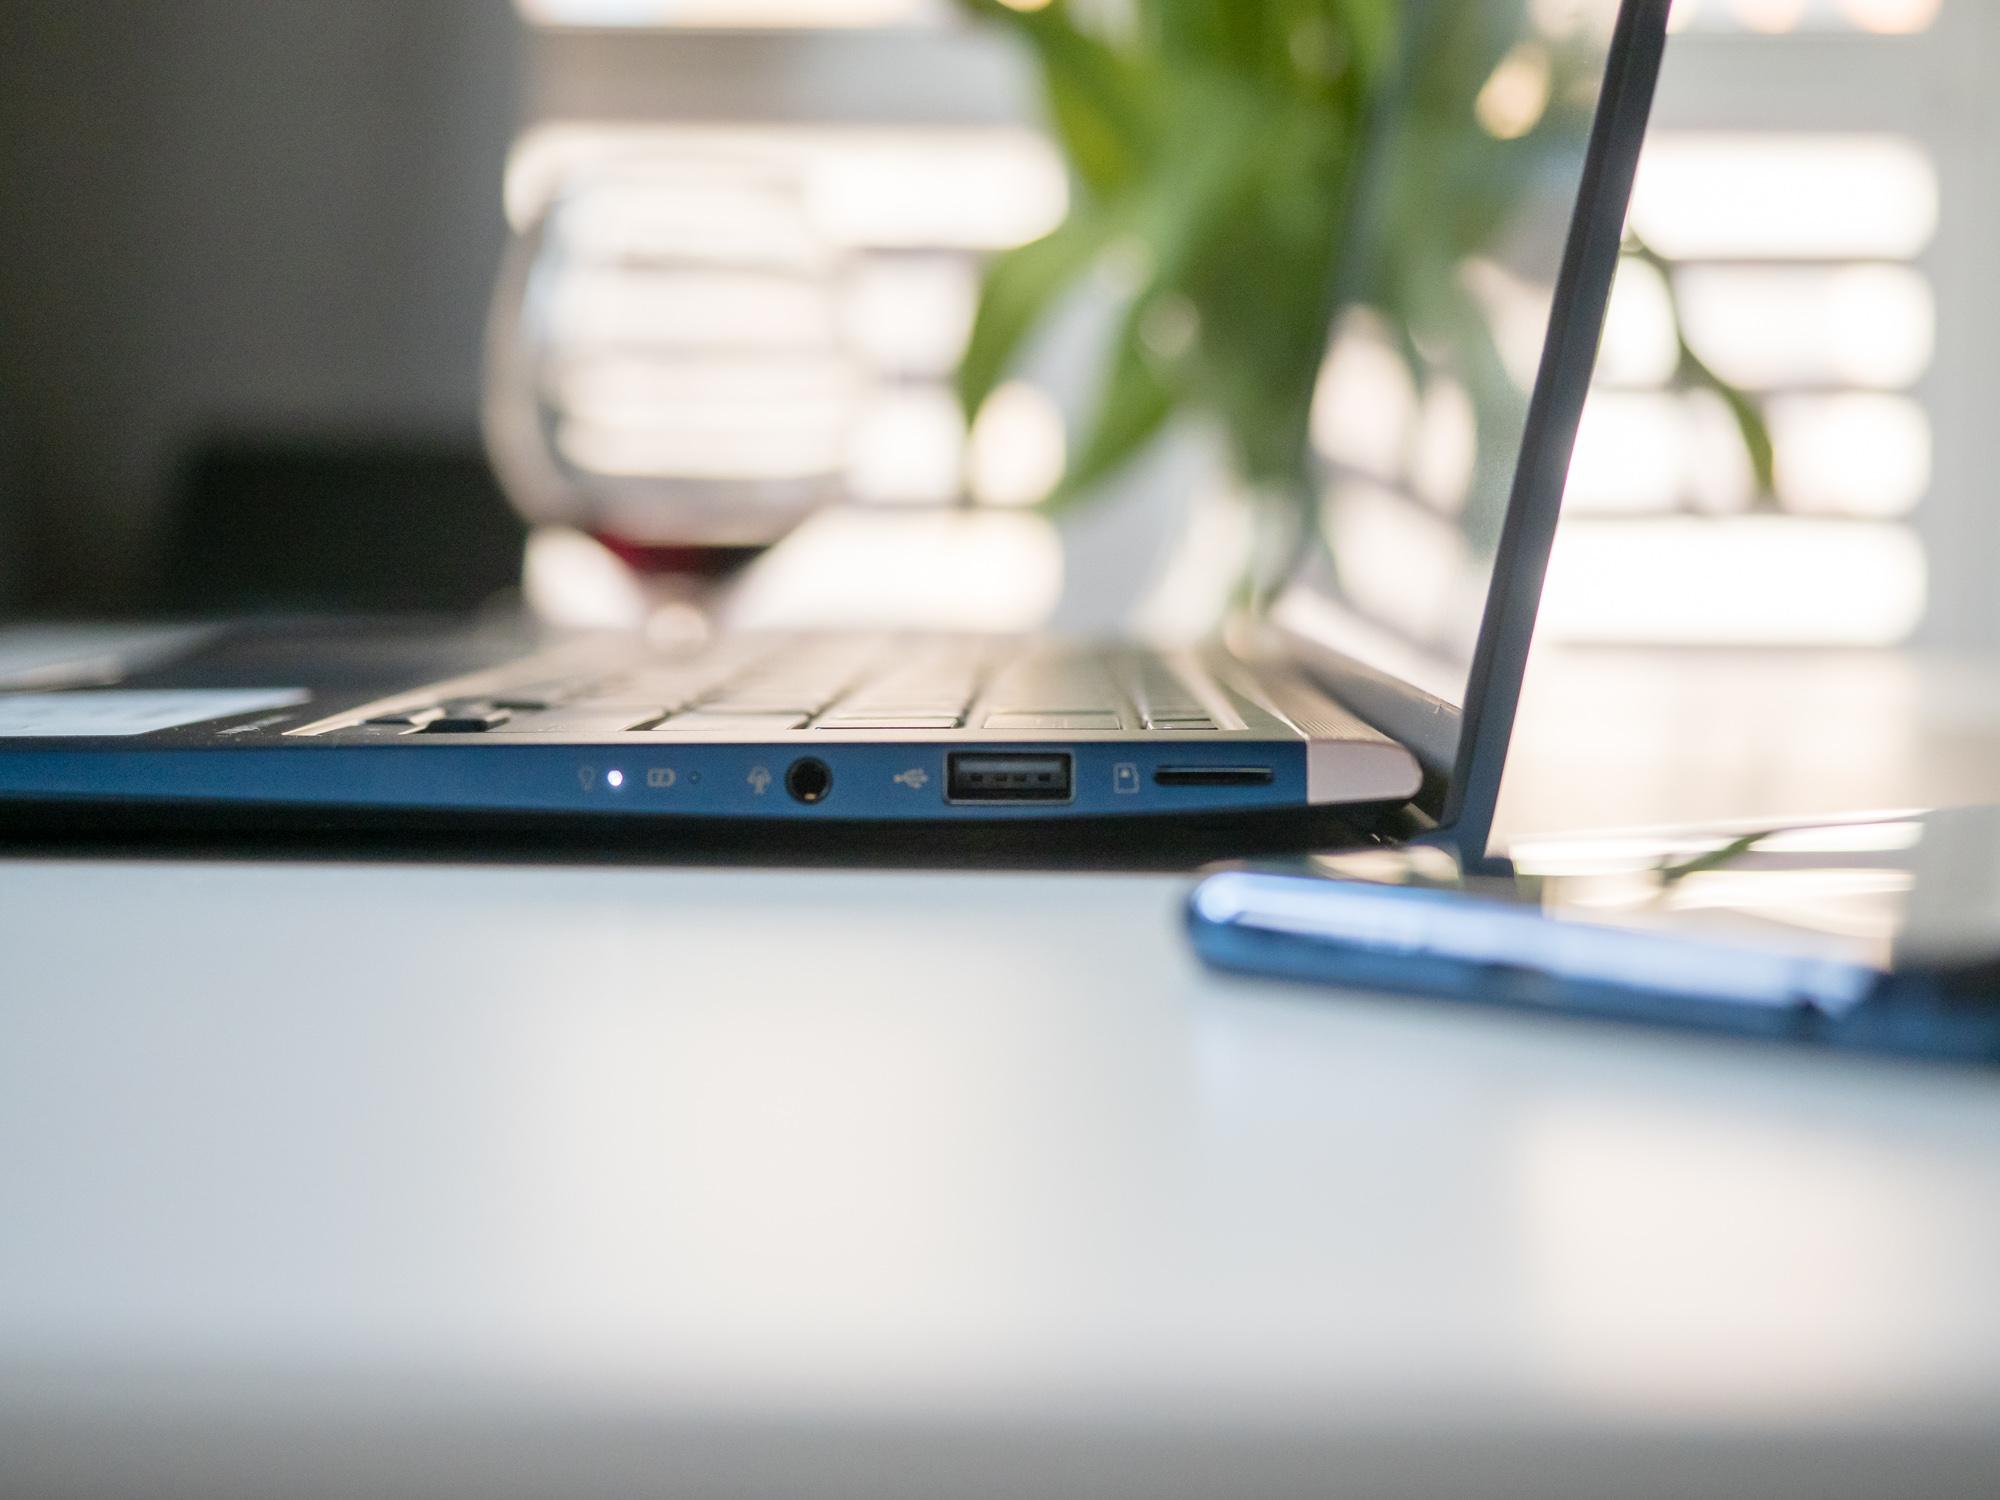 Asus UX433 - recenzja po miesiącu